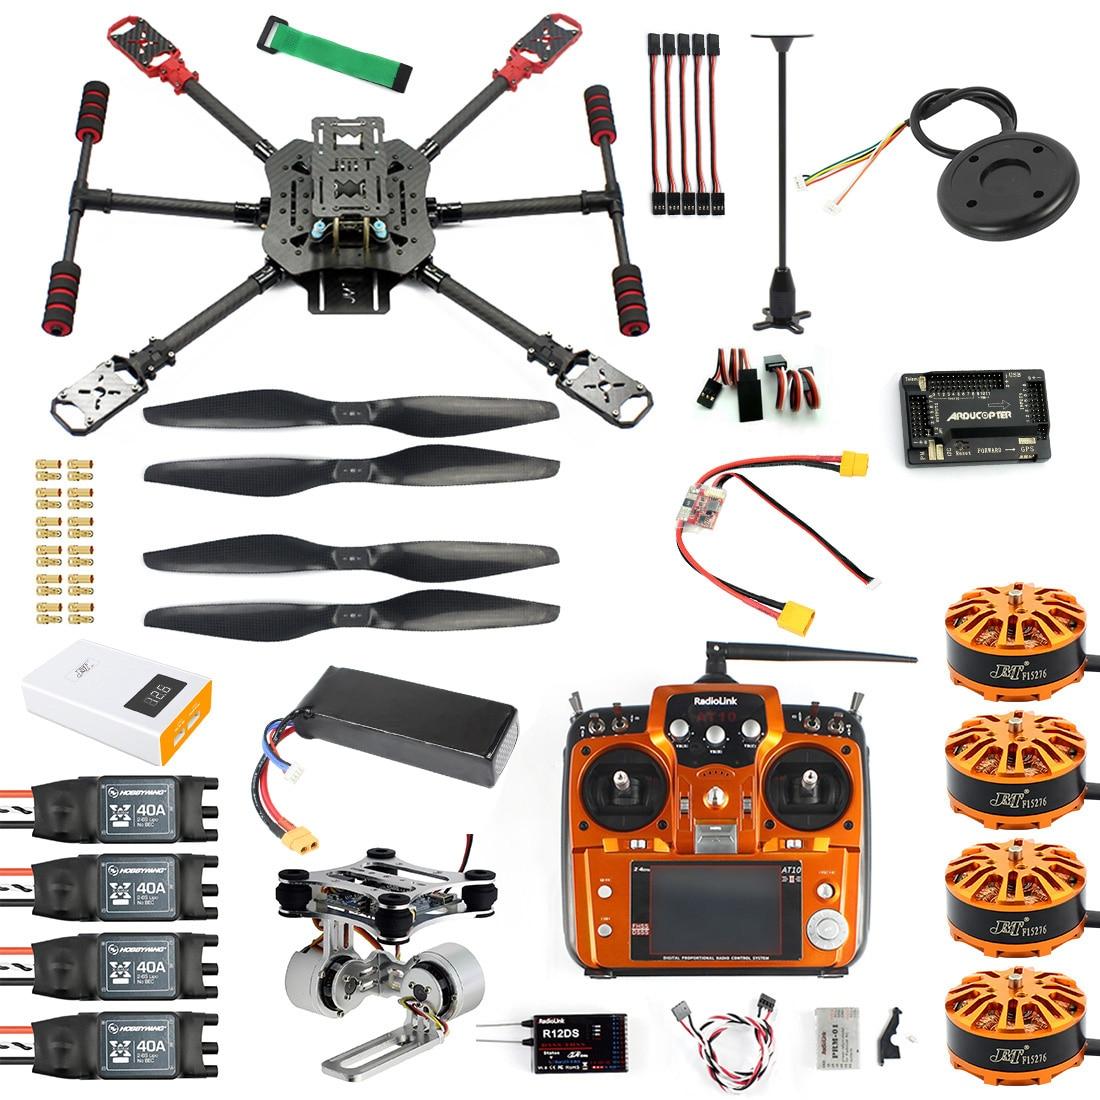 10CH 2,4 Ghz X4 460mm 560mm Dach Gefaltet RC Quadcopter 4-Achse ARF RTF Unassemble DIY GPS drone APM PIX w/Gimbal FPV Upgrade